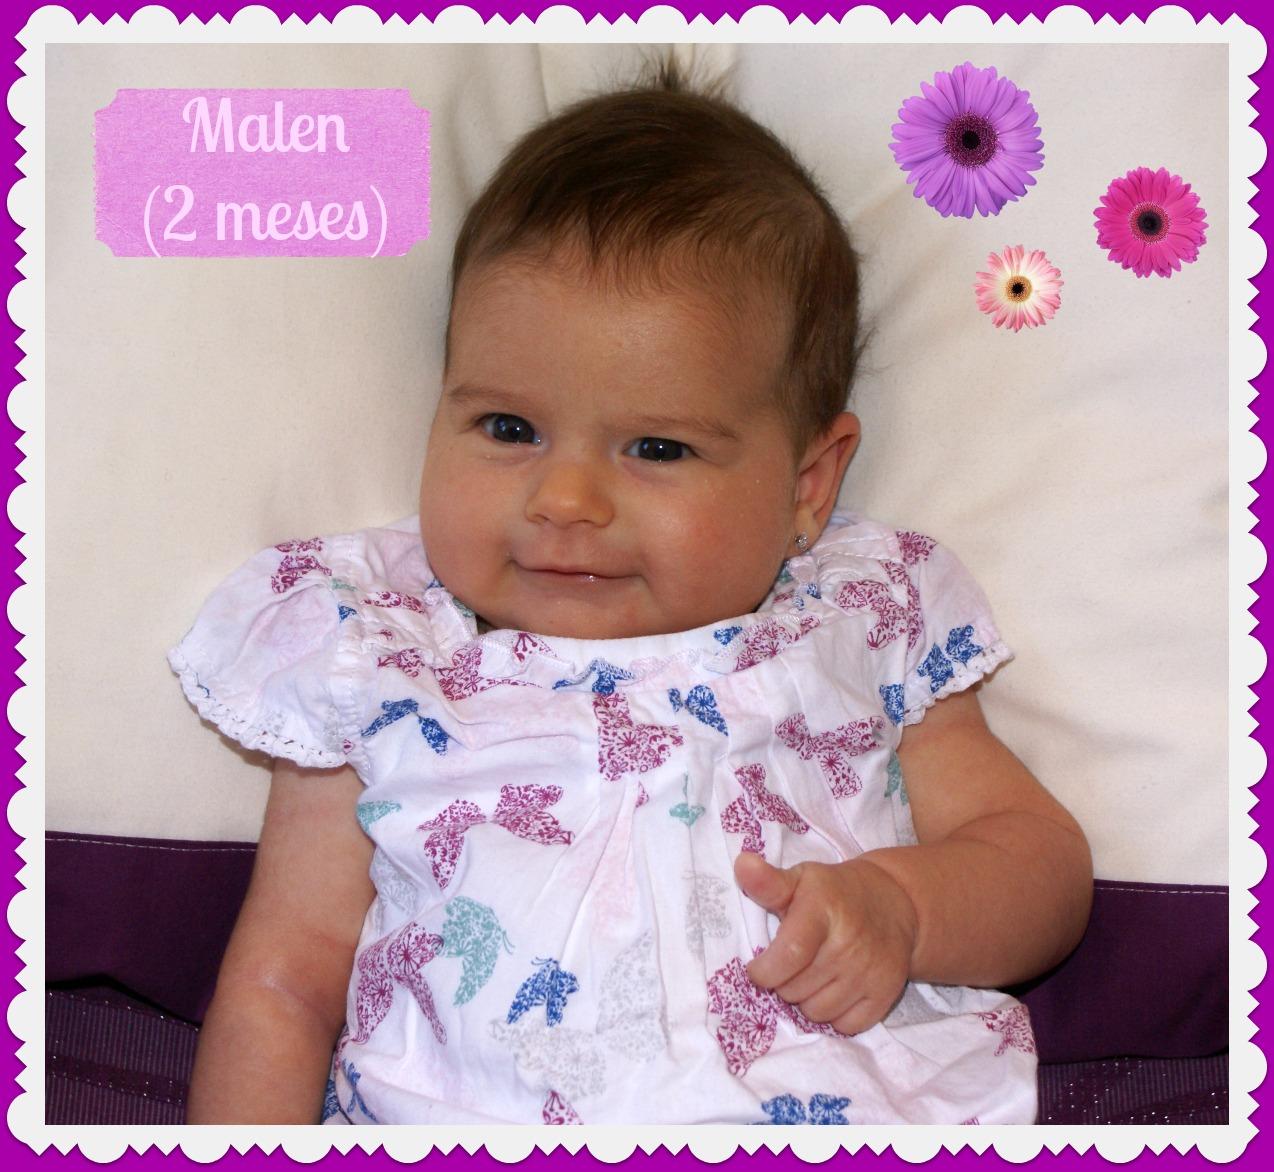 Dieta con thermomix mi beb - Tos bebe 2 meses ...